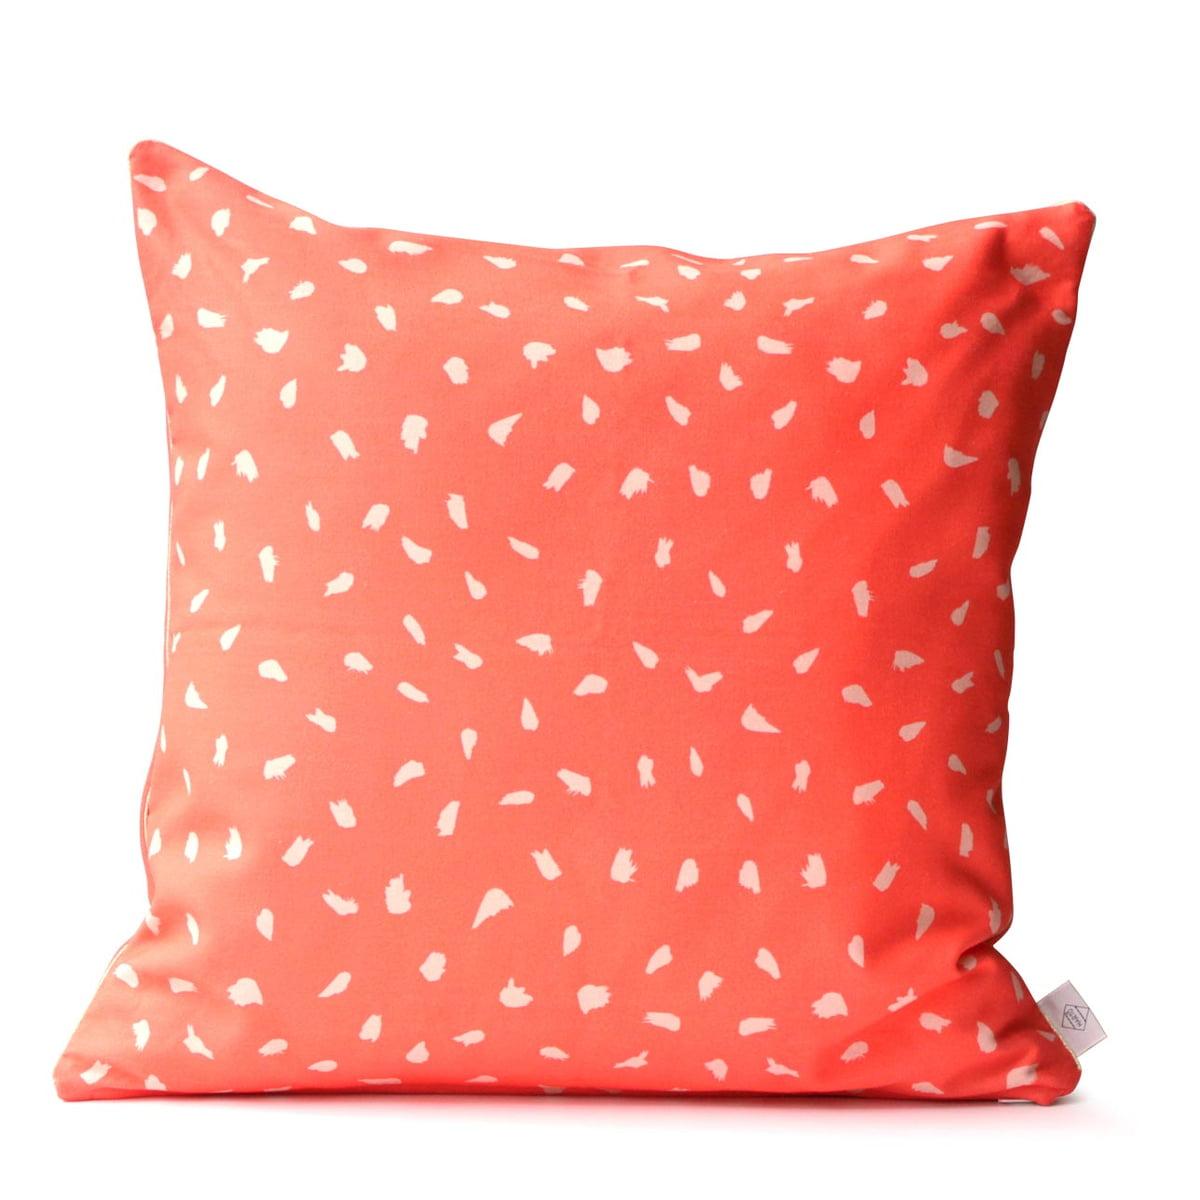 plumes kissen 50 x 50 von hart connox shop. Black Bedroom Furniture Sets. Home Design Ideas